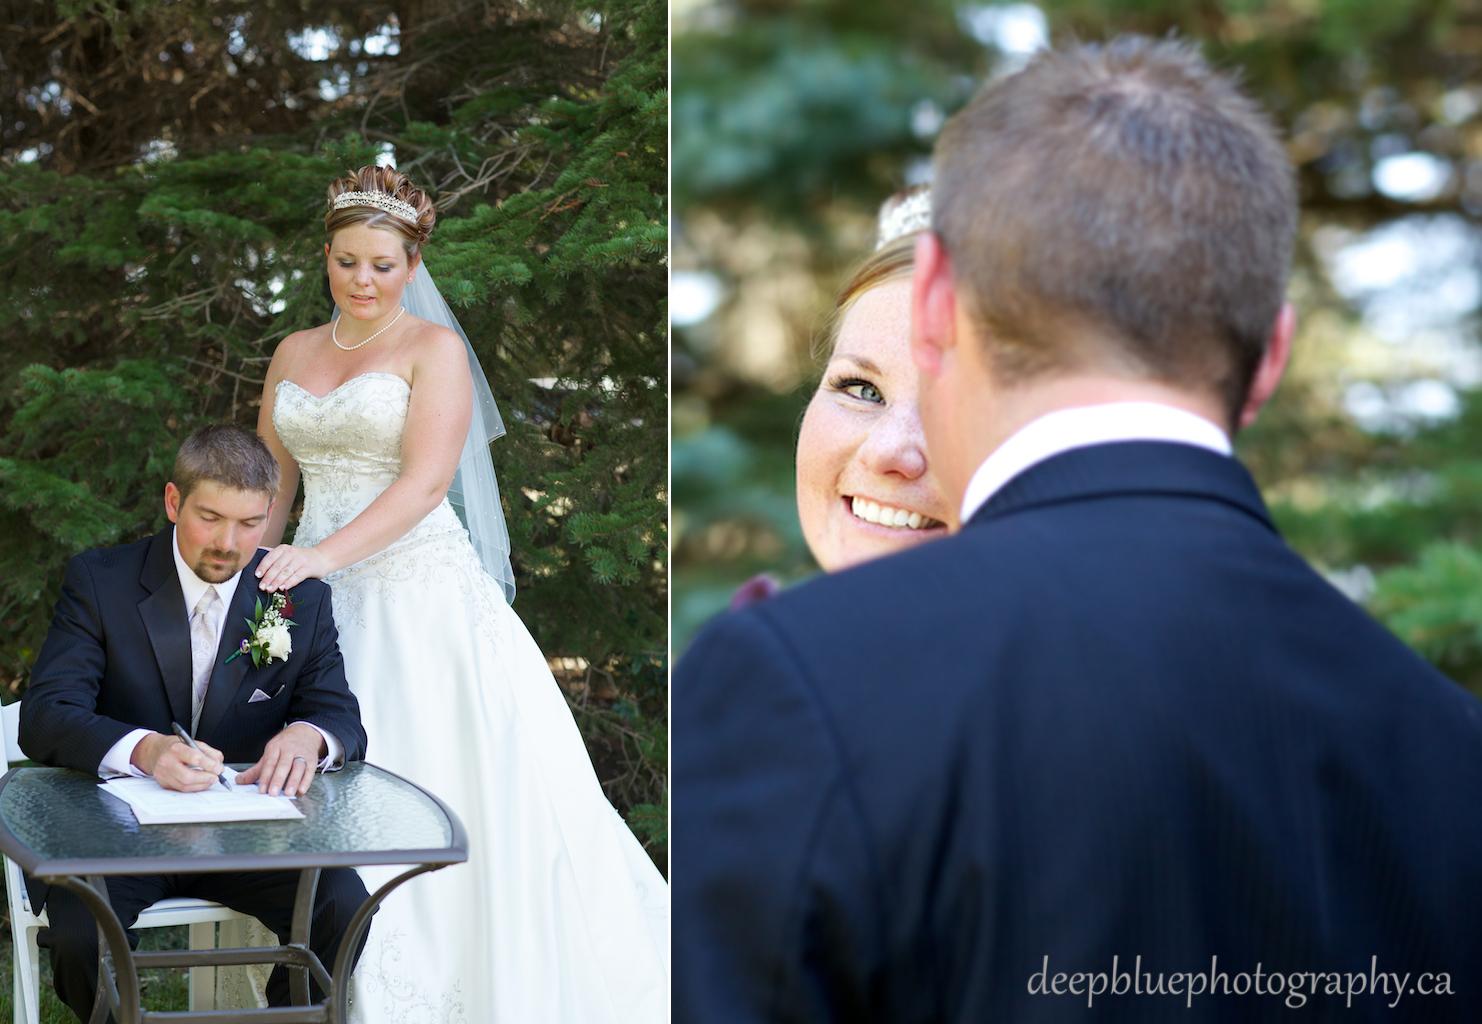 Tara and Tyler's Wedding Ceremony